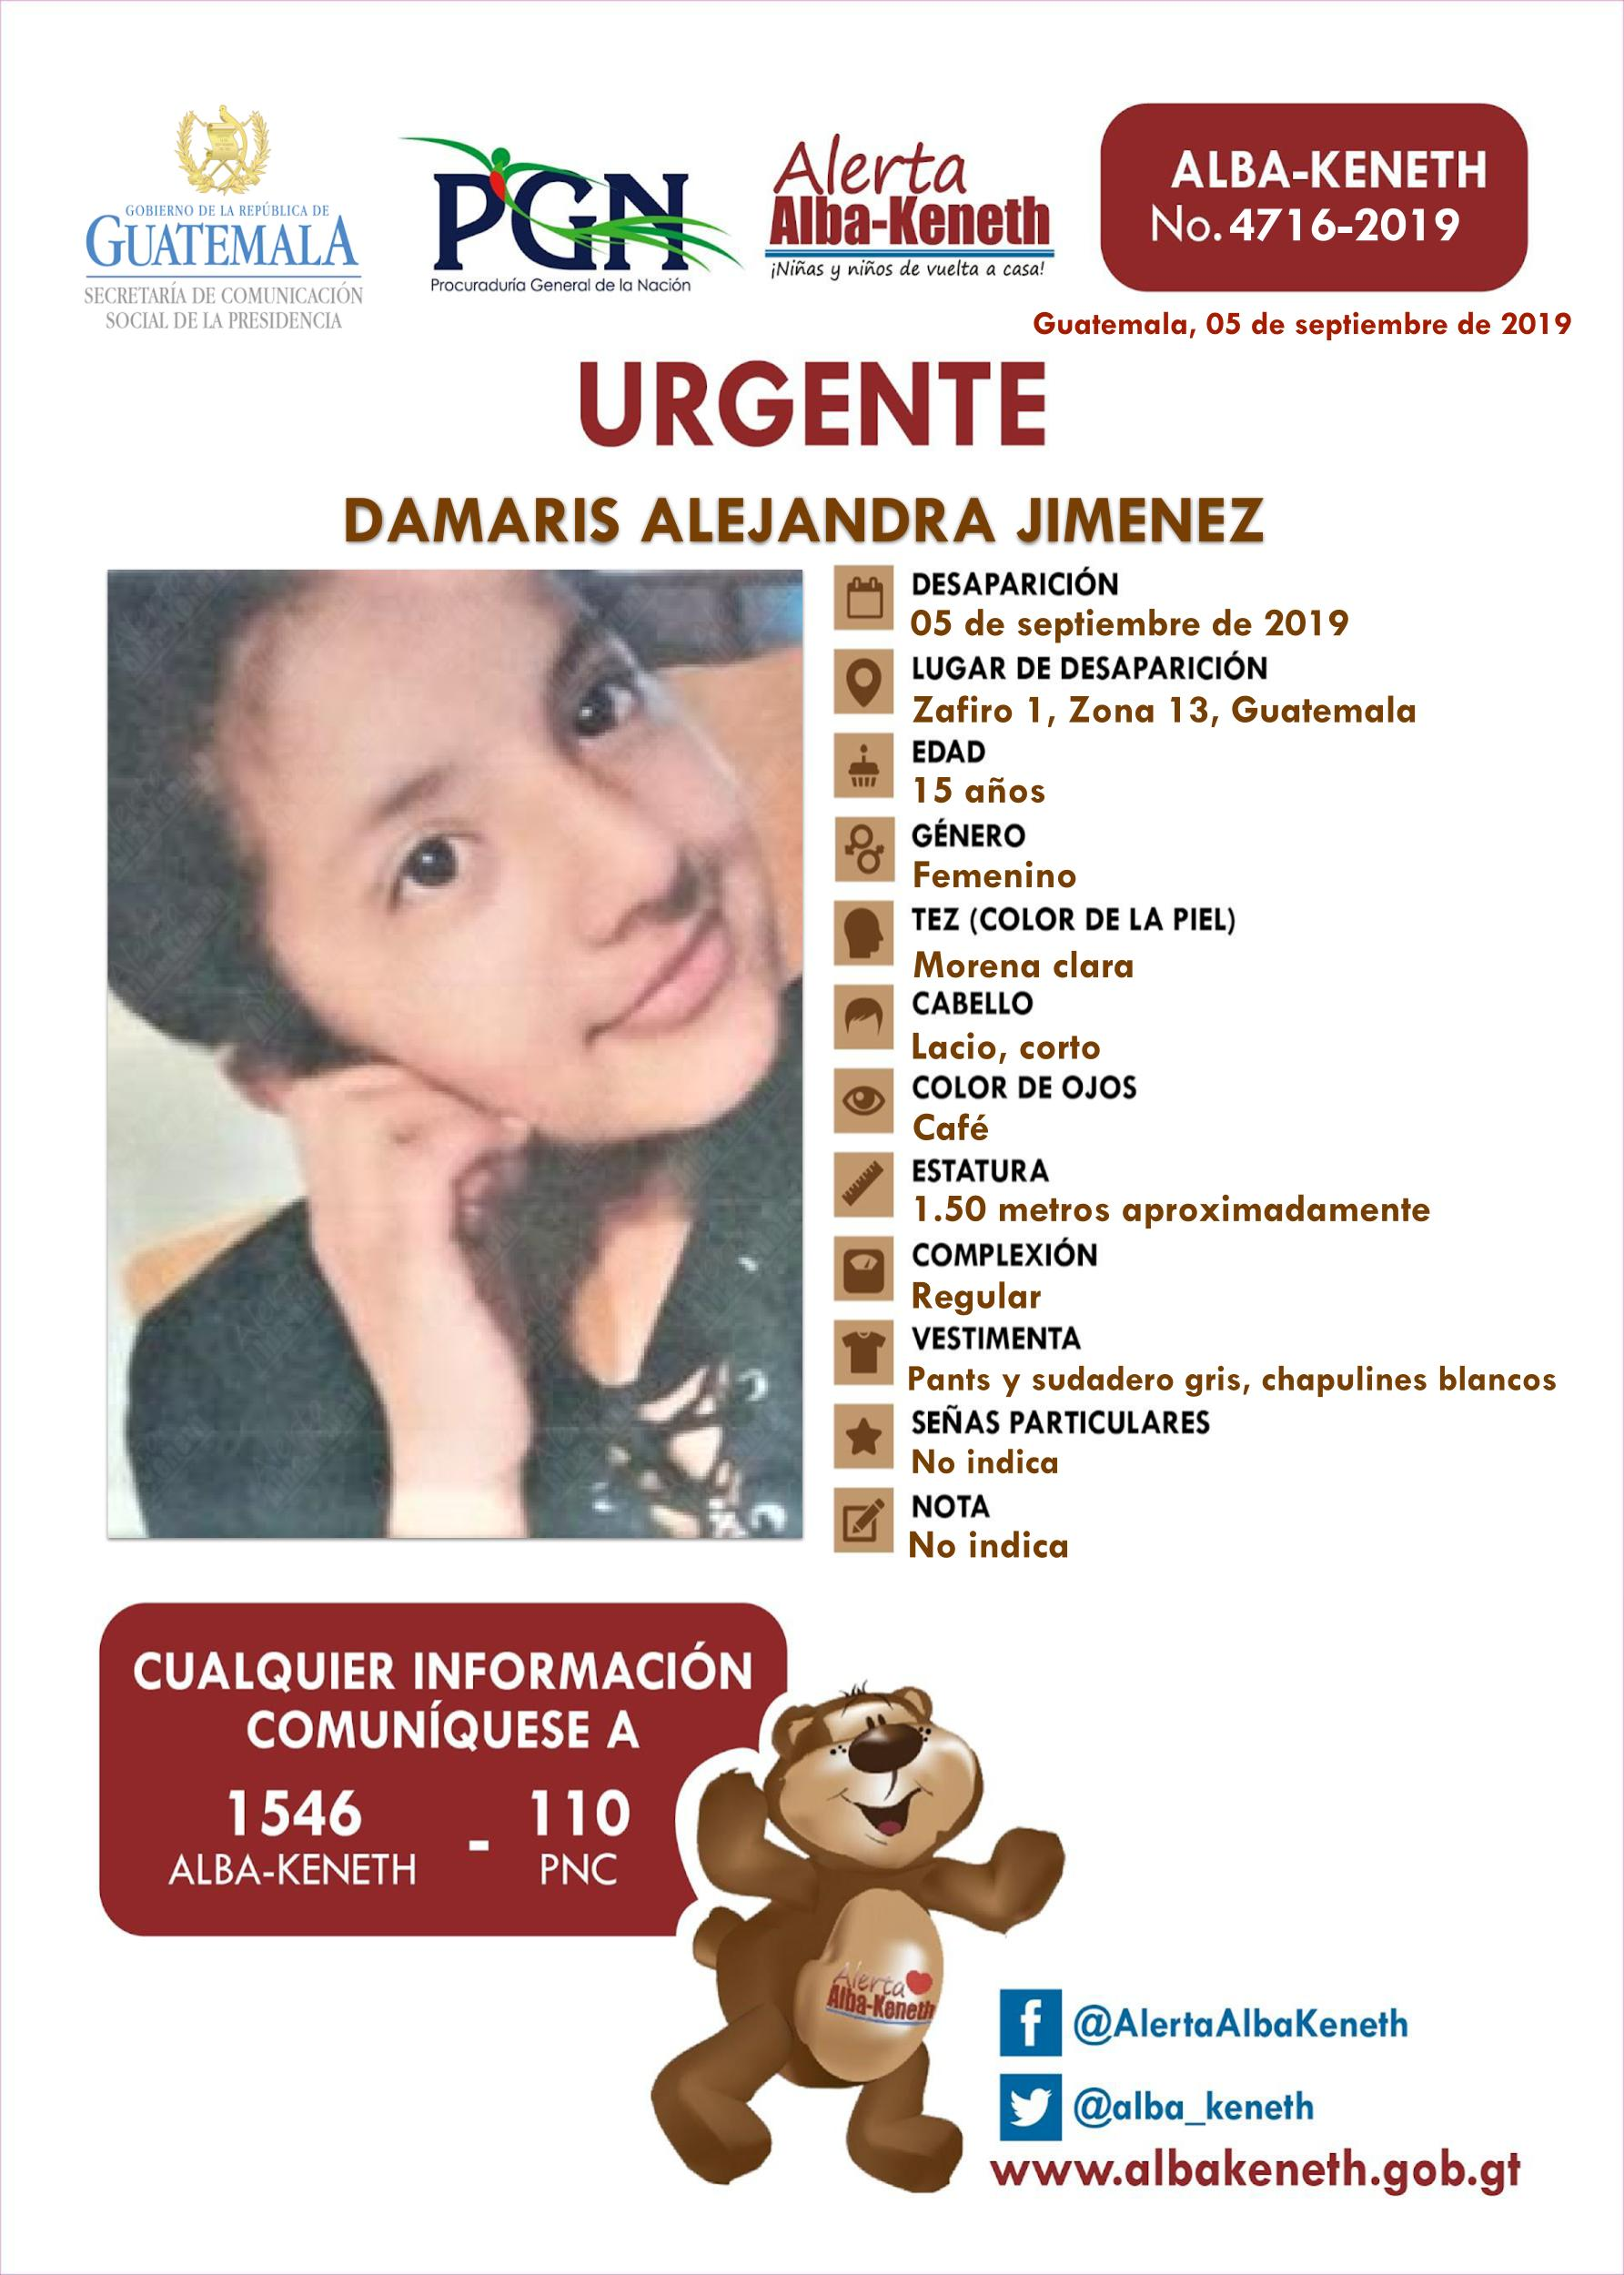 Damaris Alejandra Jimenez